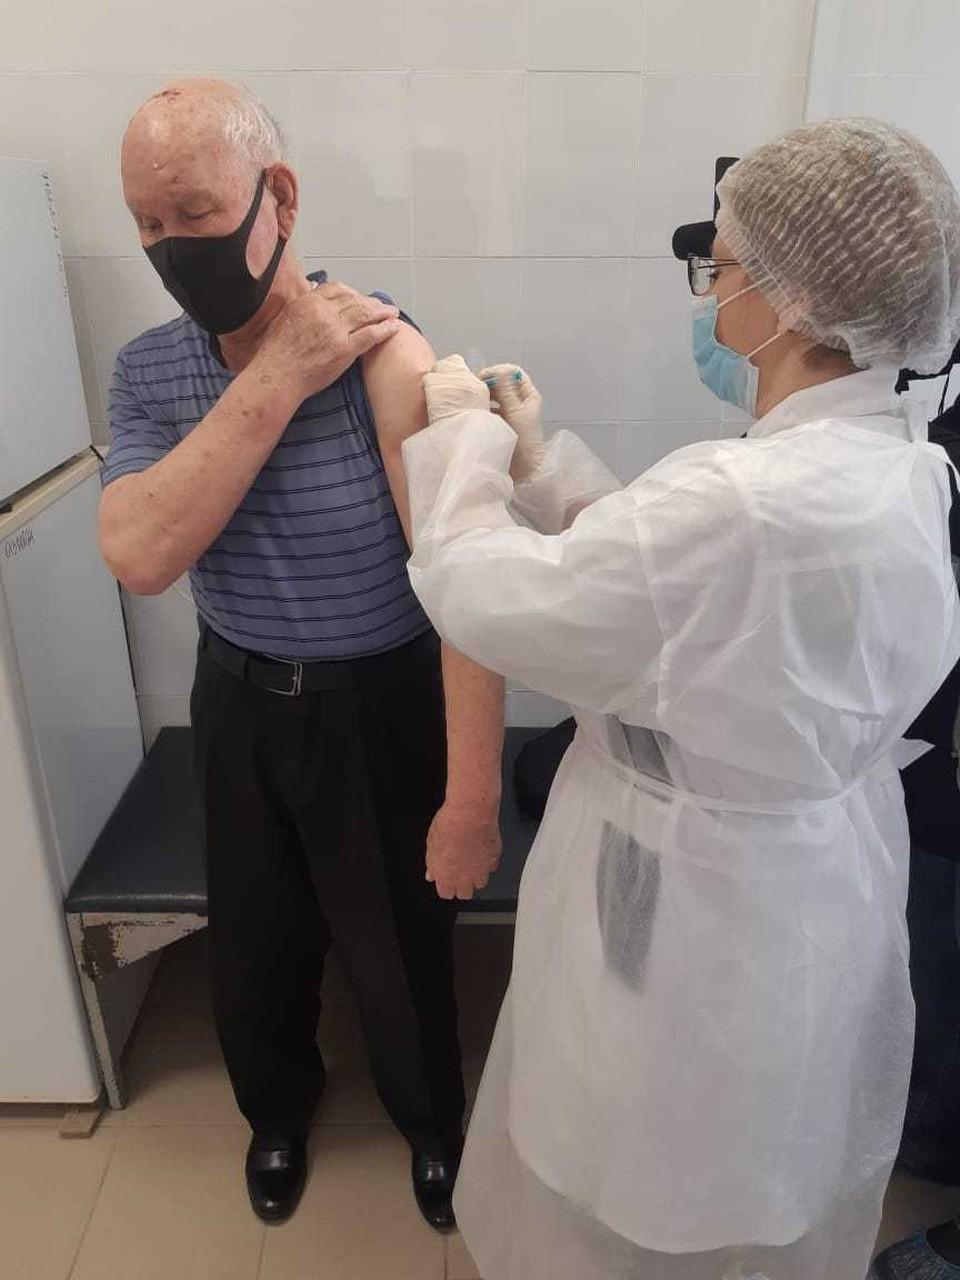 Фото: Министерство здравоохранения Астраханской области